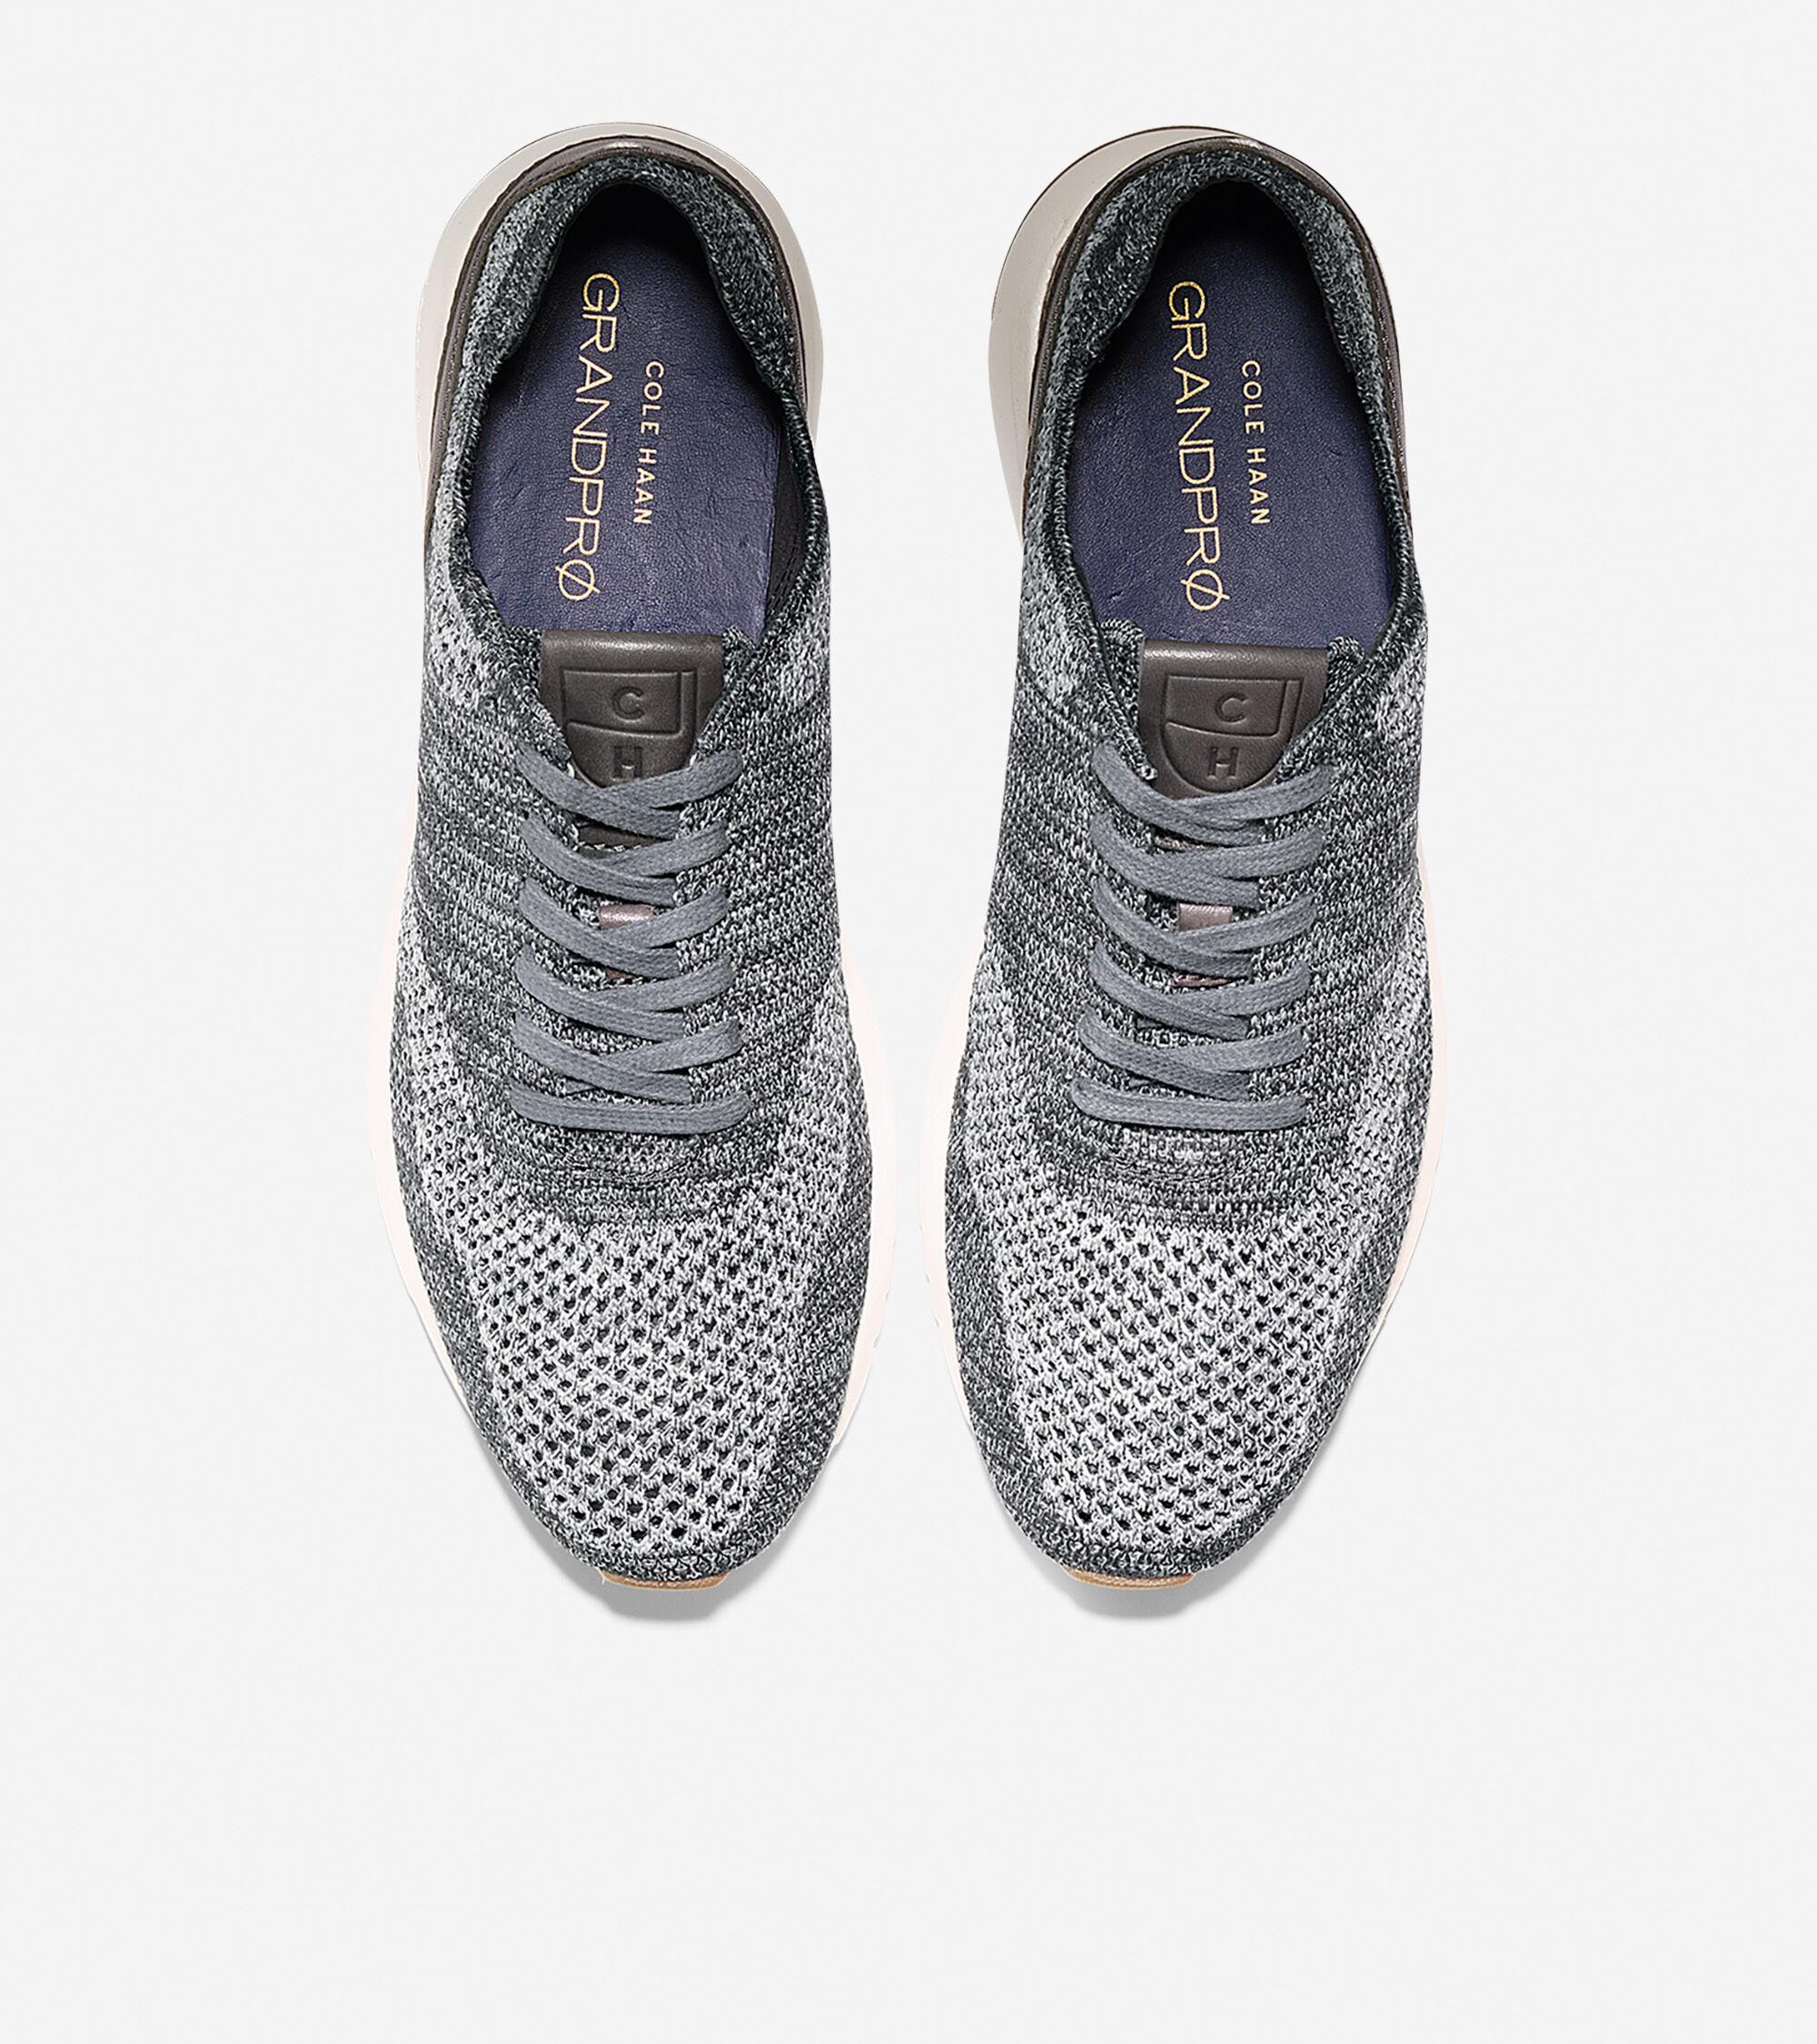 Cole Haan Men's Grandpro Runner Stitchlite Sneaker IzhwU6p